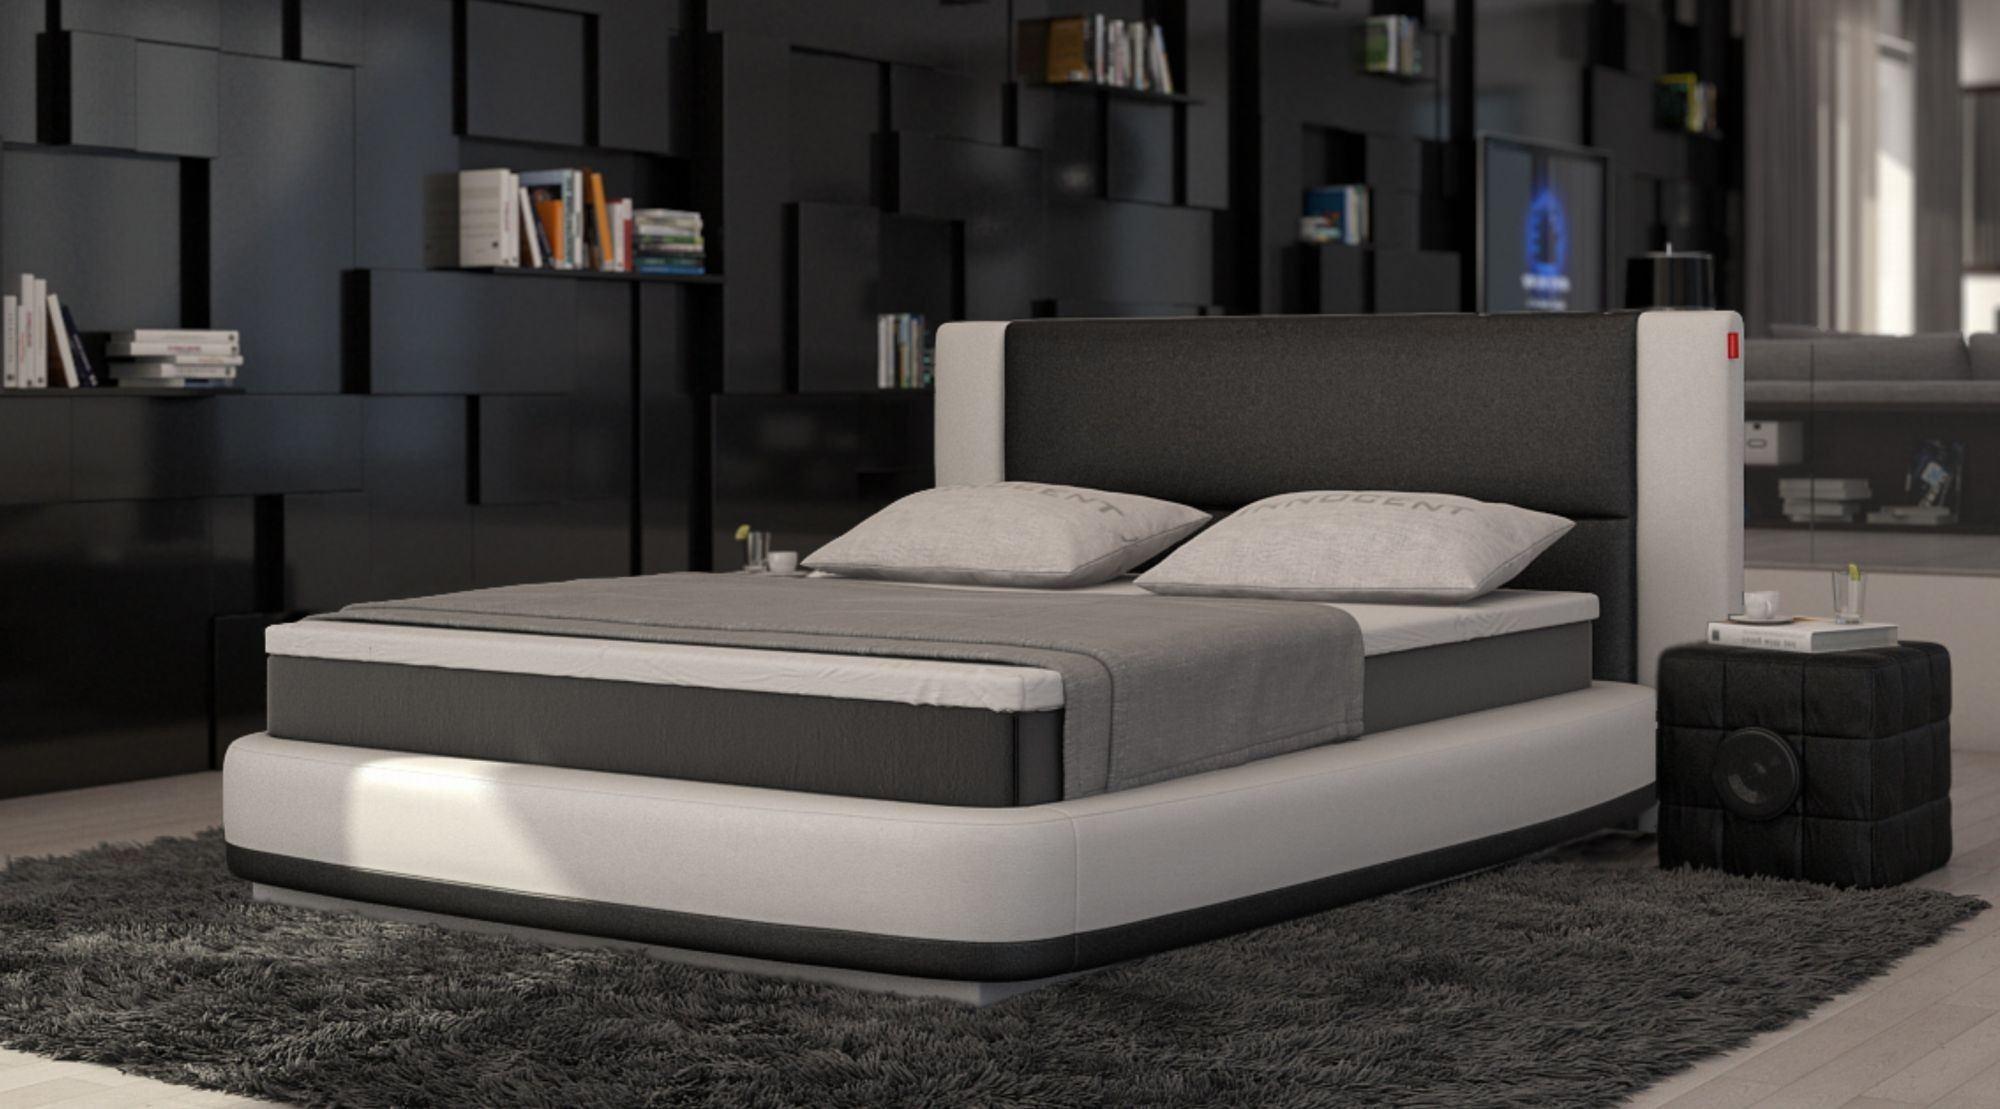 Boxspringbett Aquila Ist Das Moderne Designerbett Zum Top